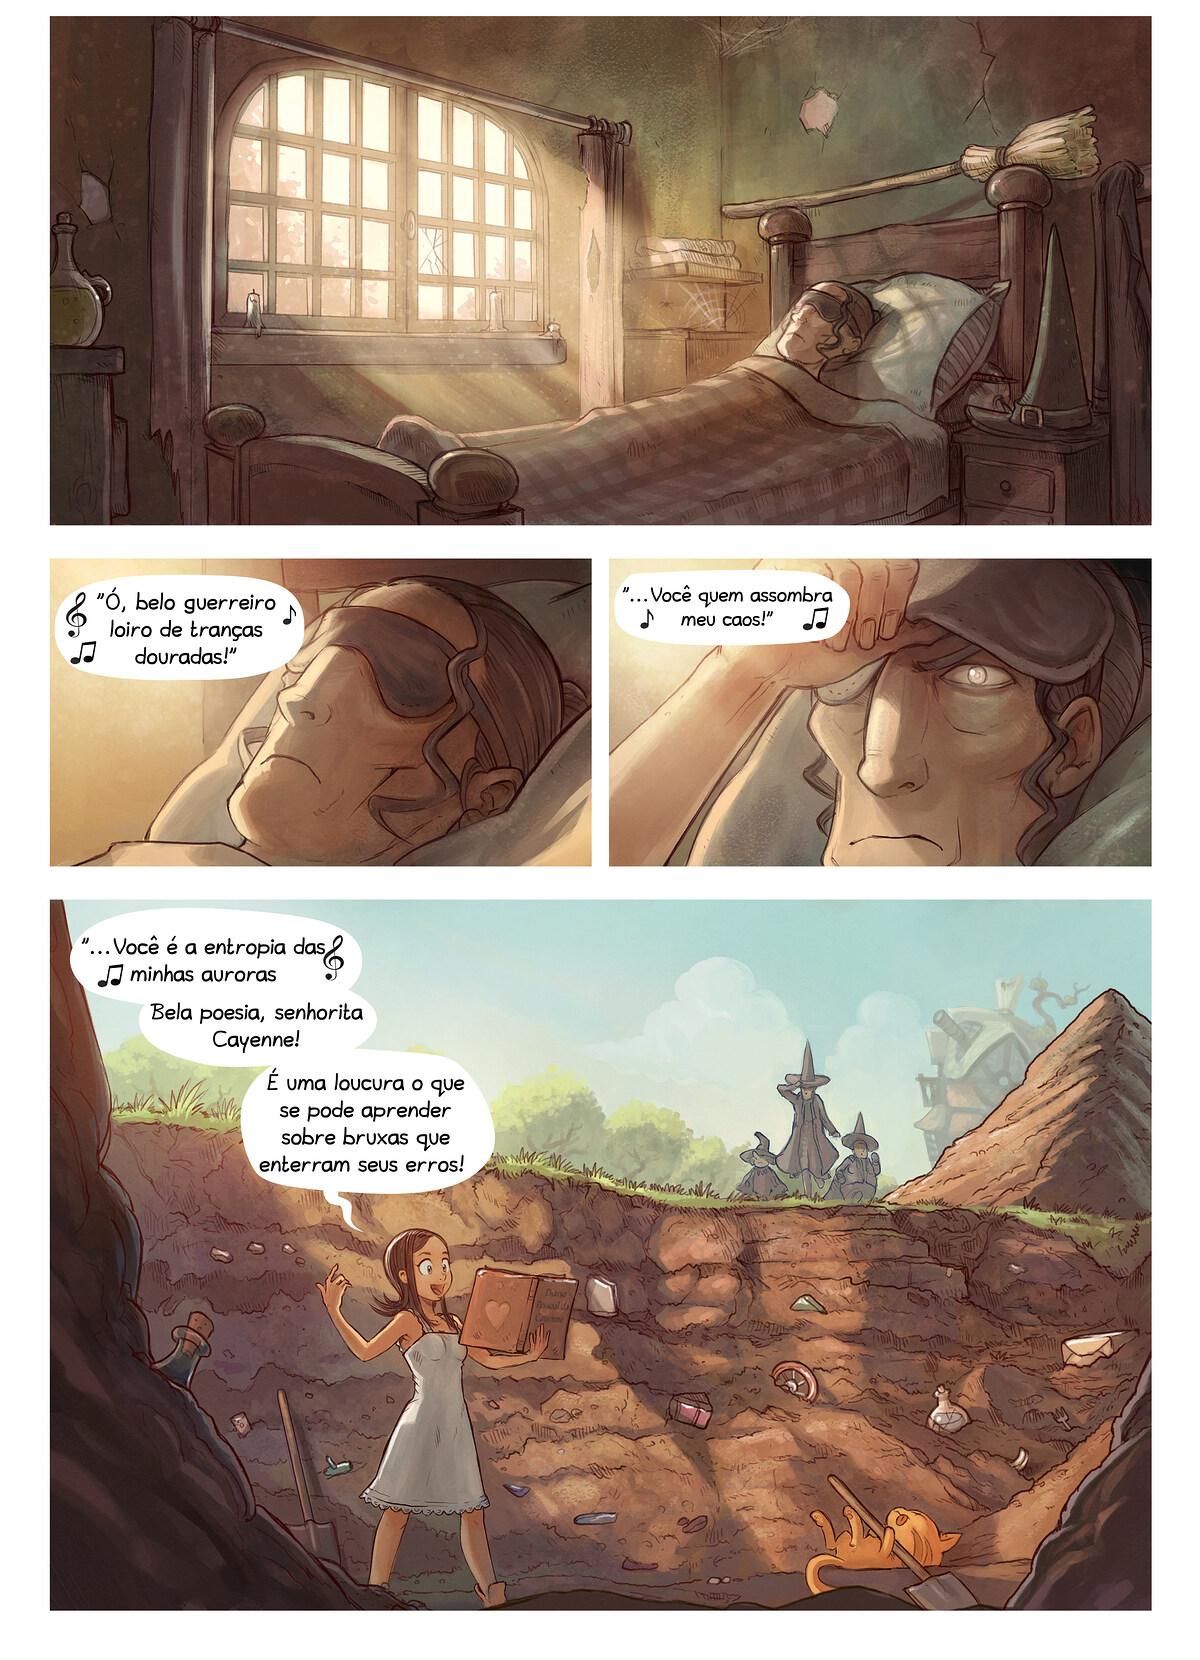 A webcomic page of Pepper&Carrot, episódio 19 [pt], página 4